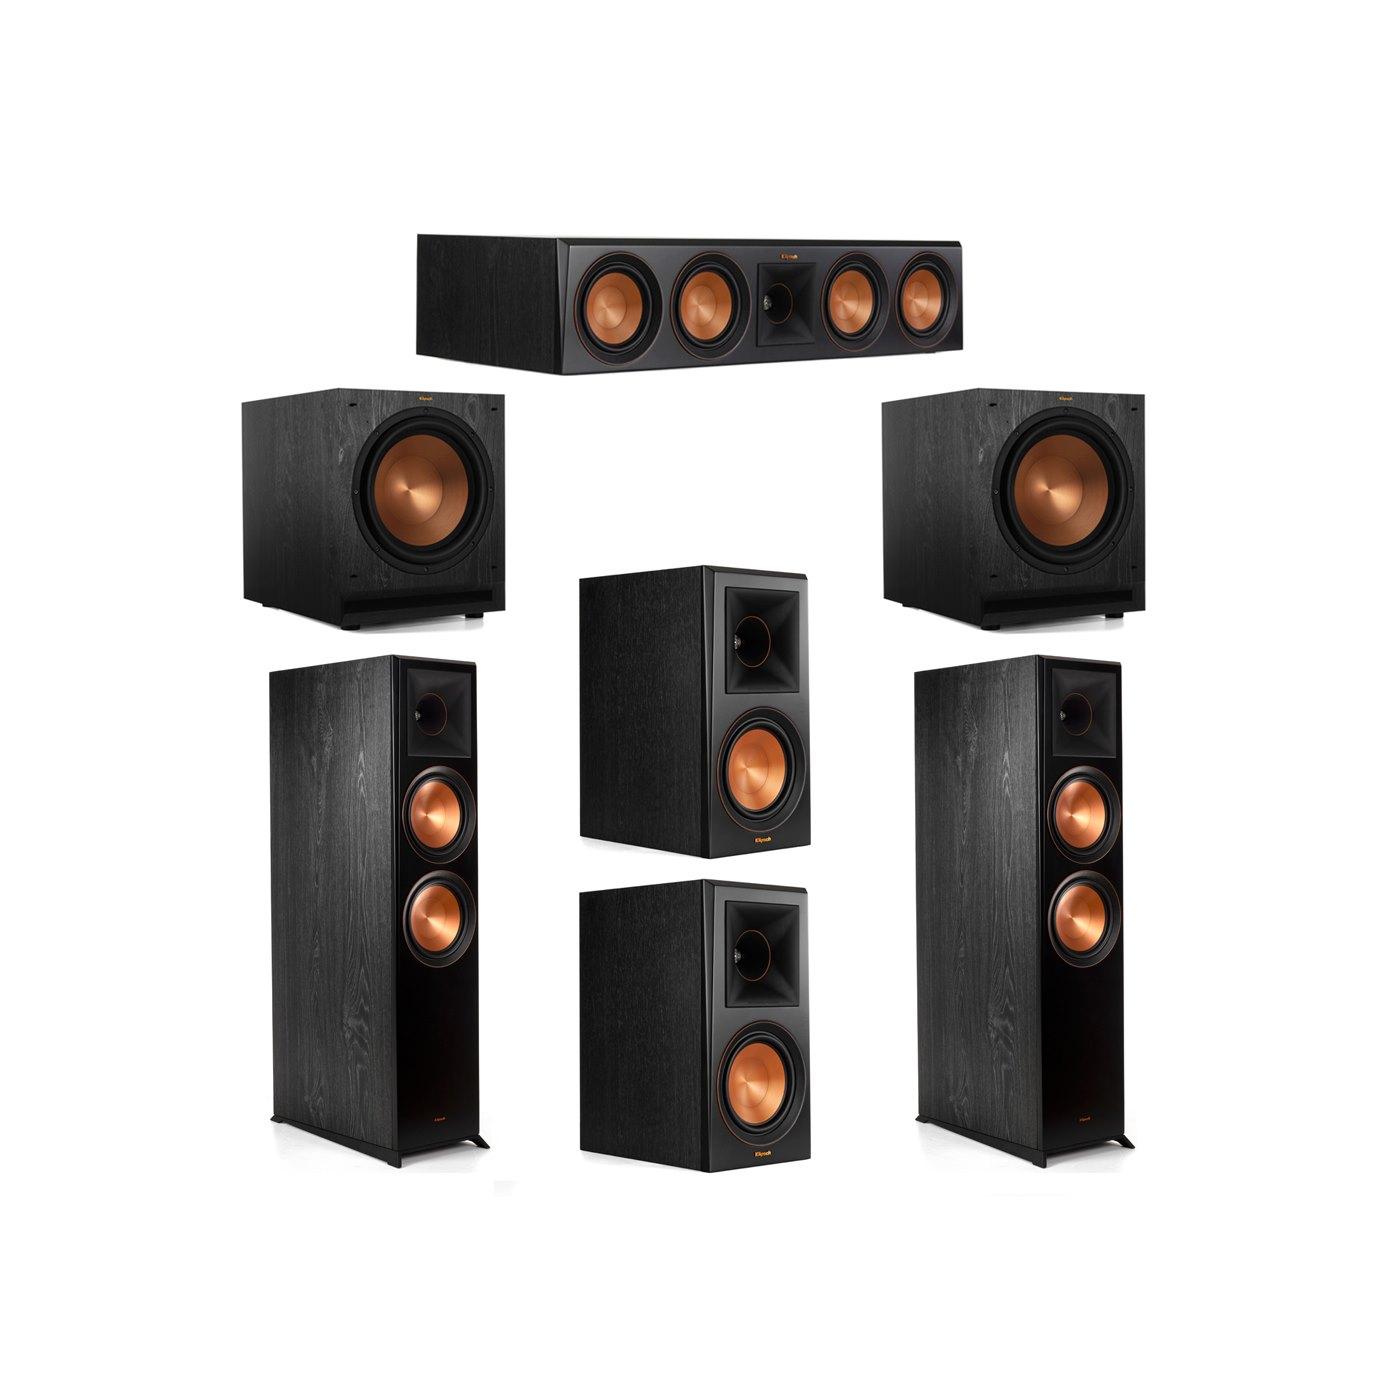 Klipsch 5.2 System with 2 RP-8000F Floorstanding Speakers, 1 Klipsch RP-504C Center Speaker, 2 Klipsch RP-600M Surround Speakers, 2 Klipsch SPL-120 Subwoofers